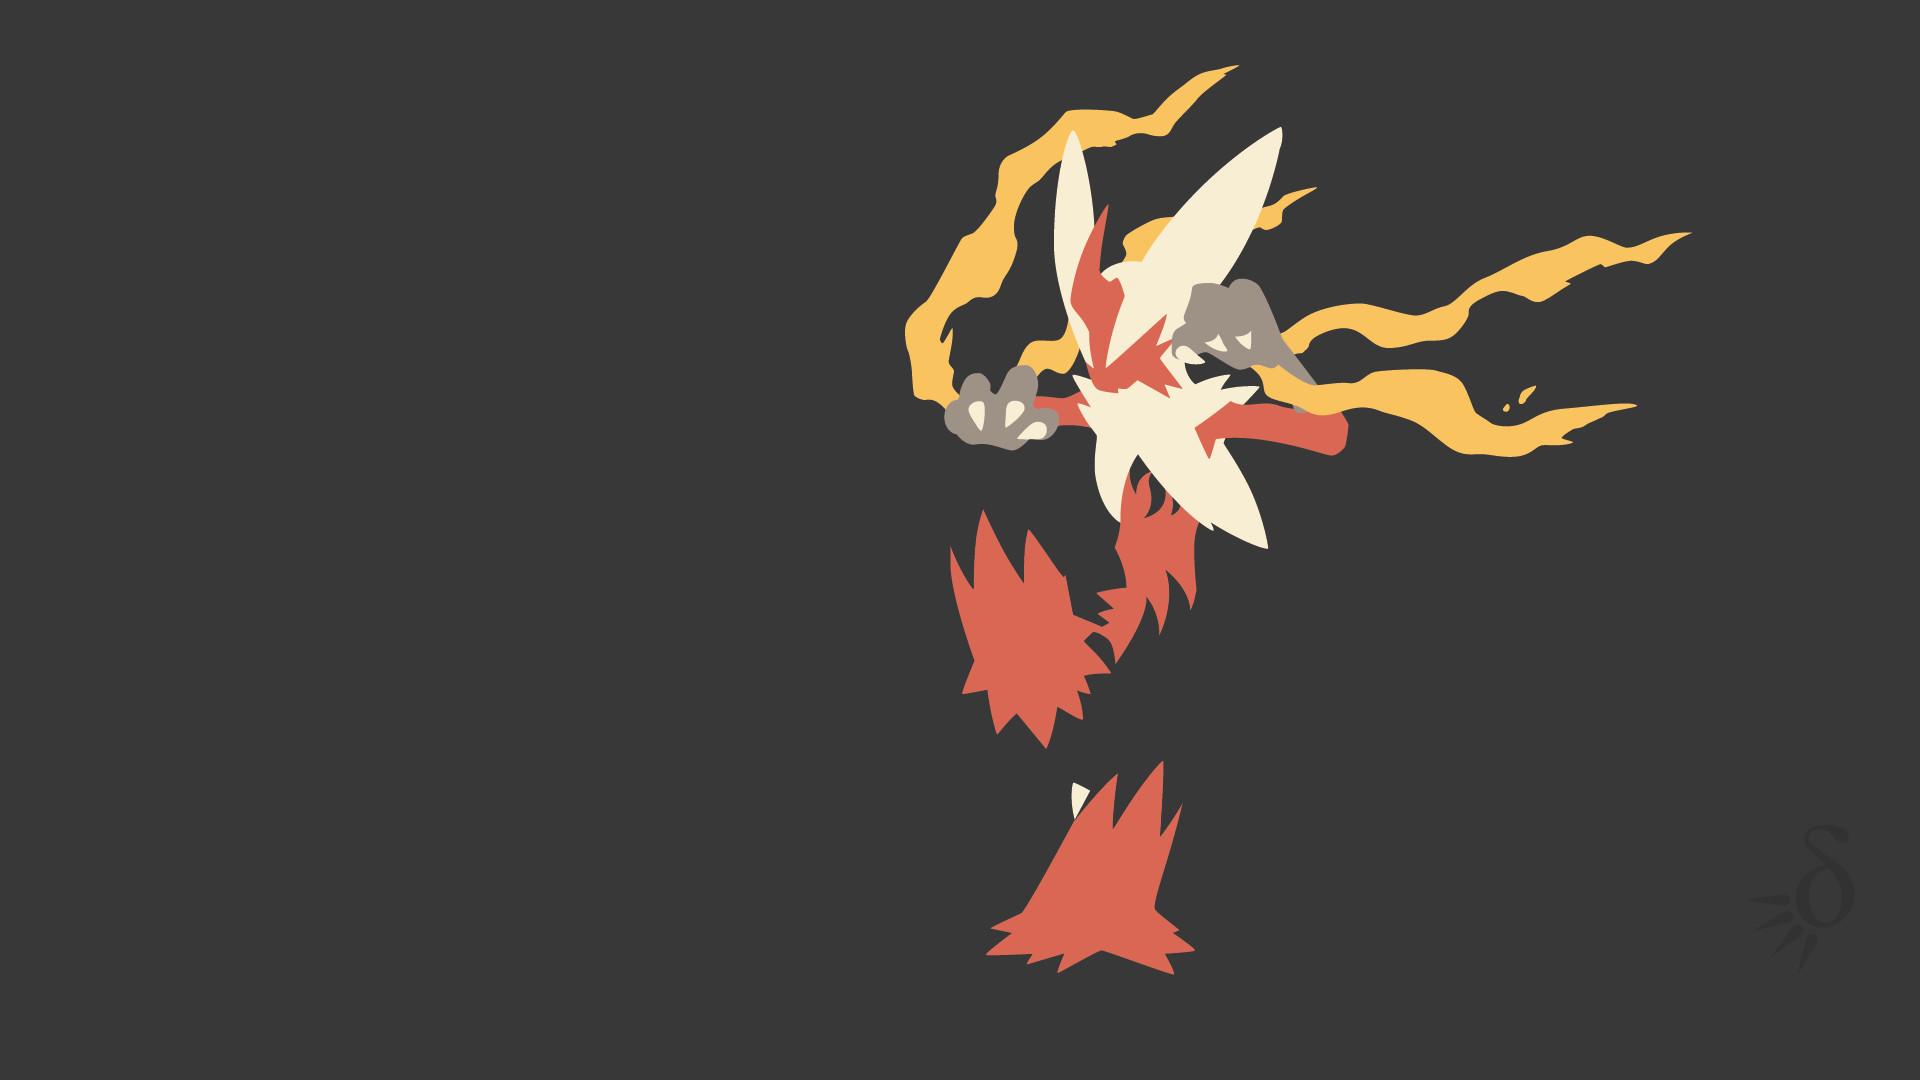 Res: 1920x1080, Pokemon Lucario Picture Download Free.